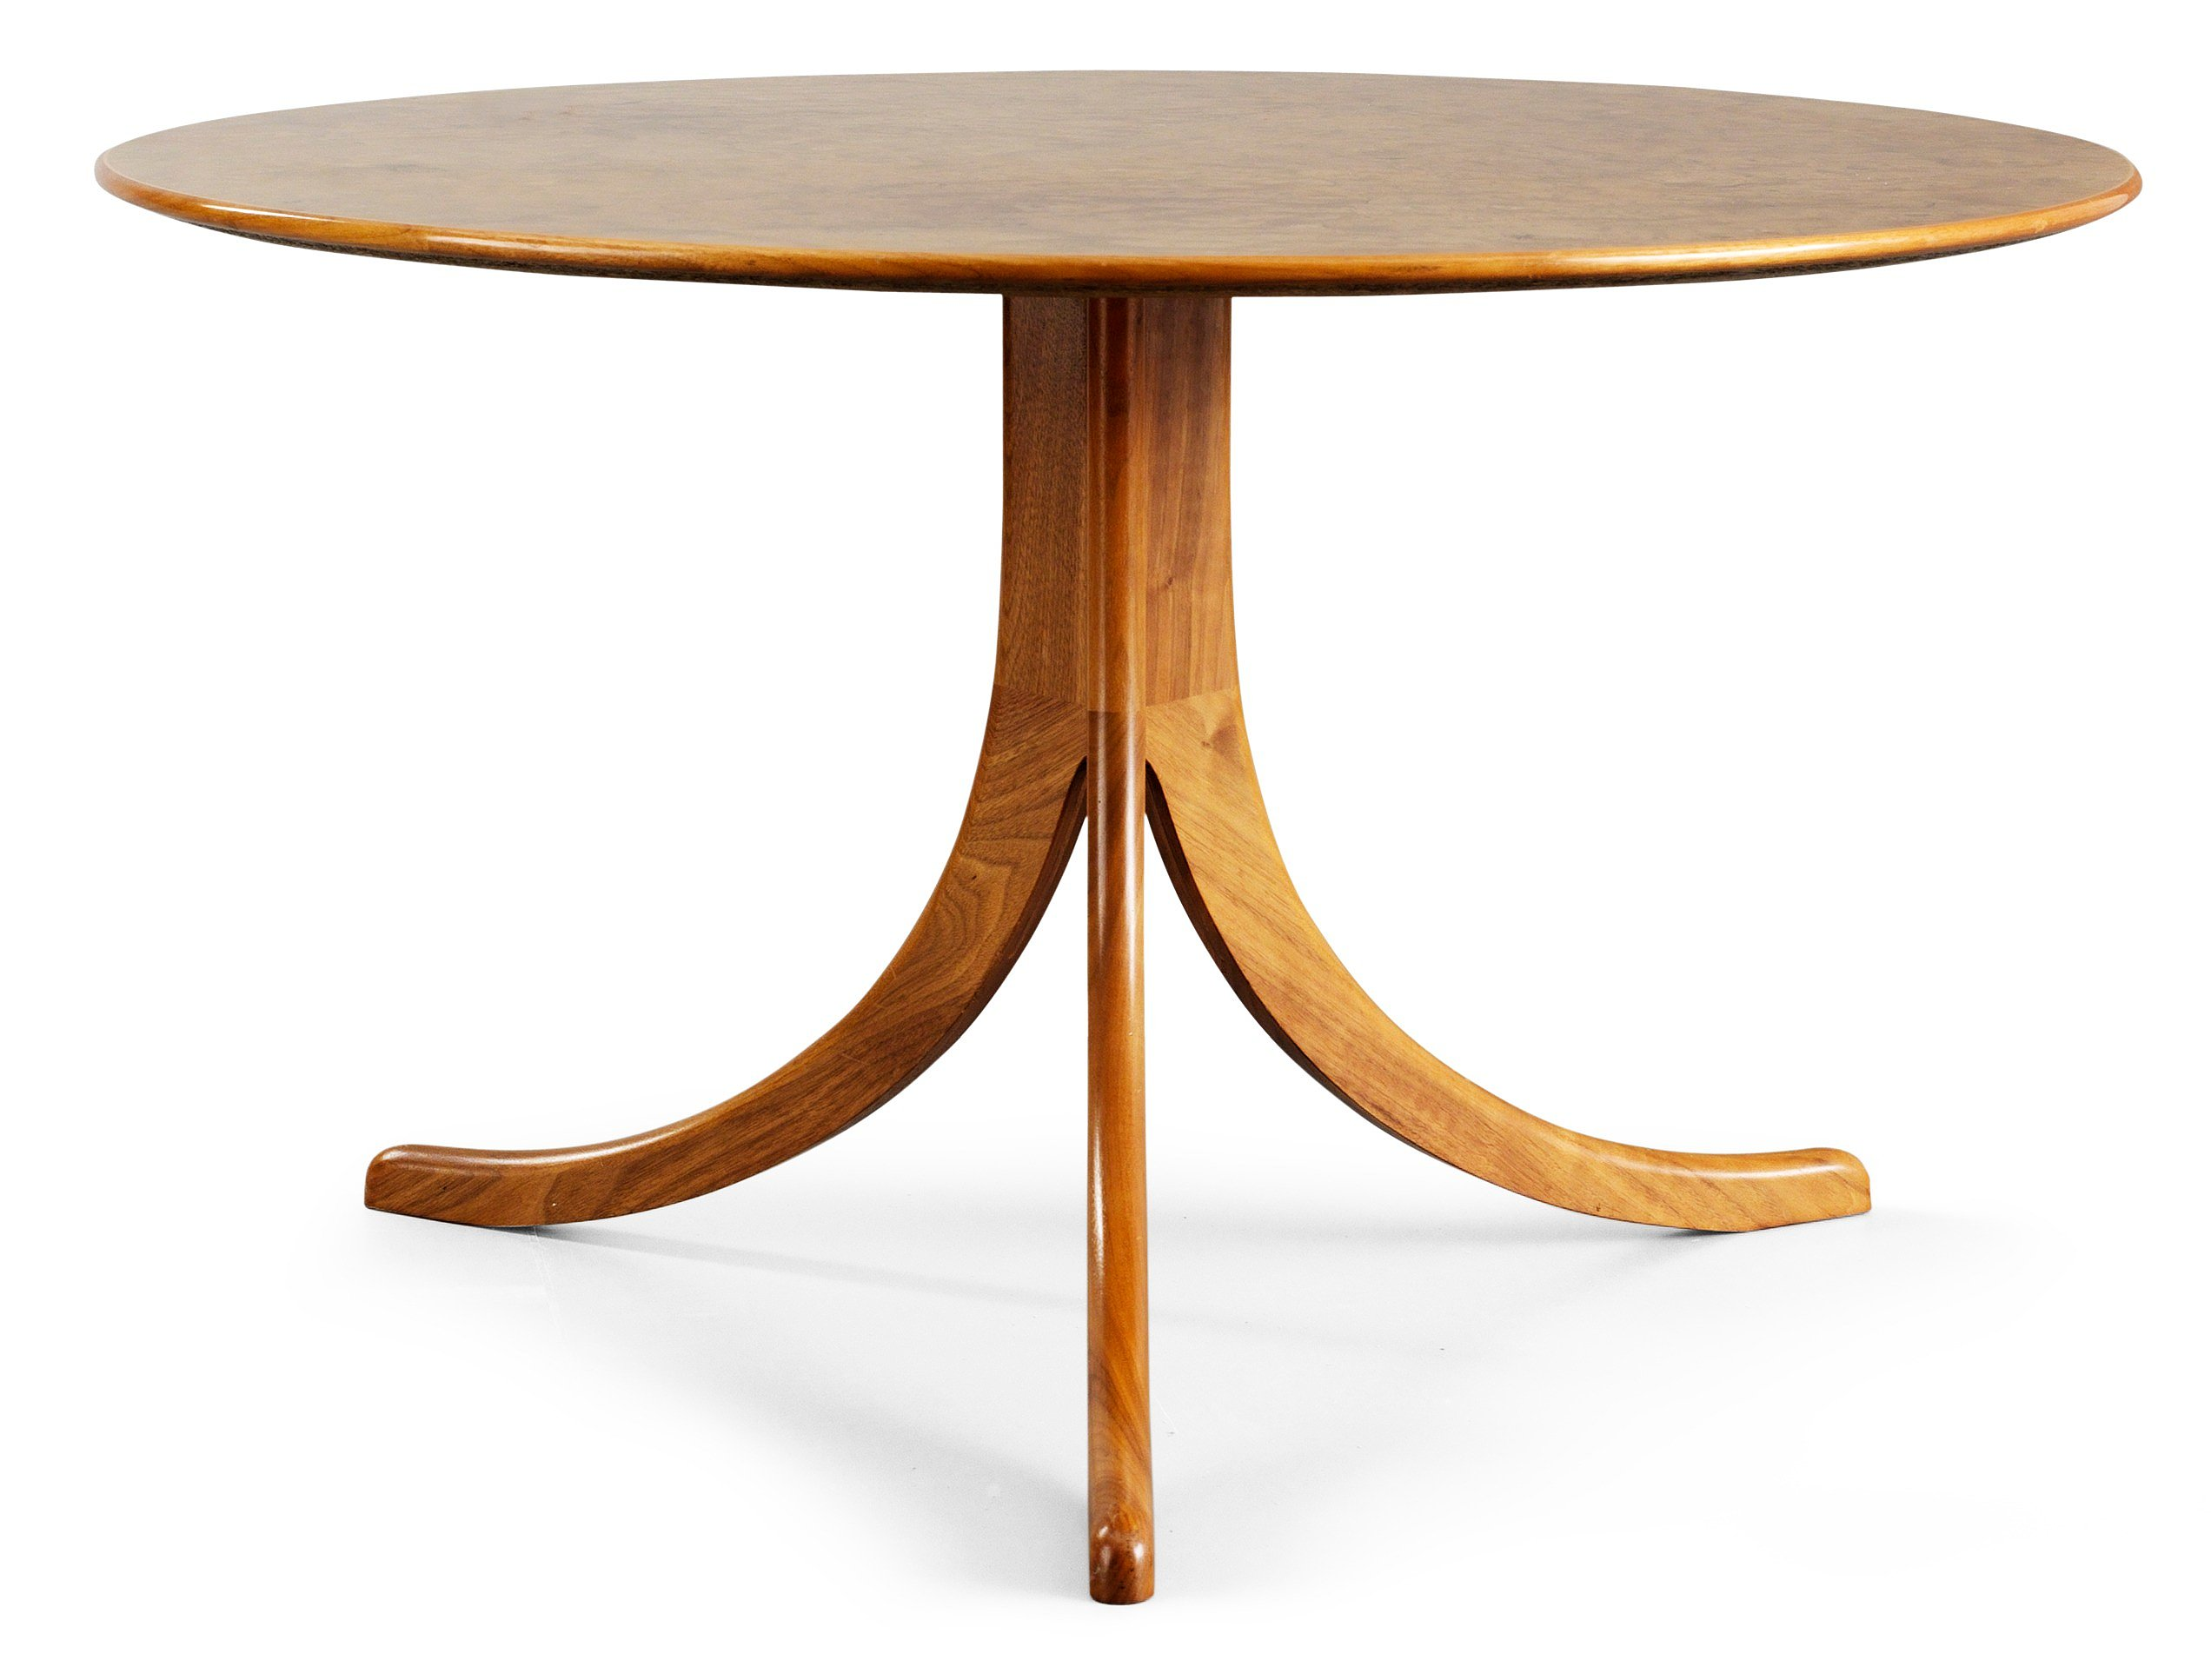 A Josef Frank burrwood and walnut sofa table, model 1020 Bukowskis